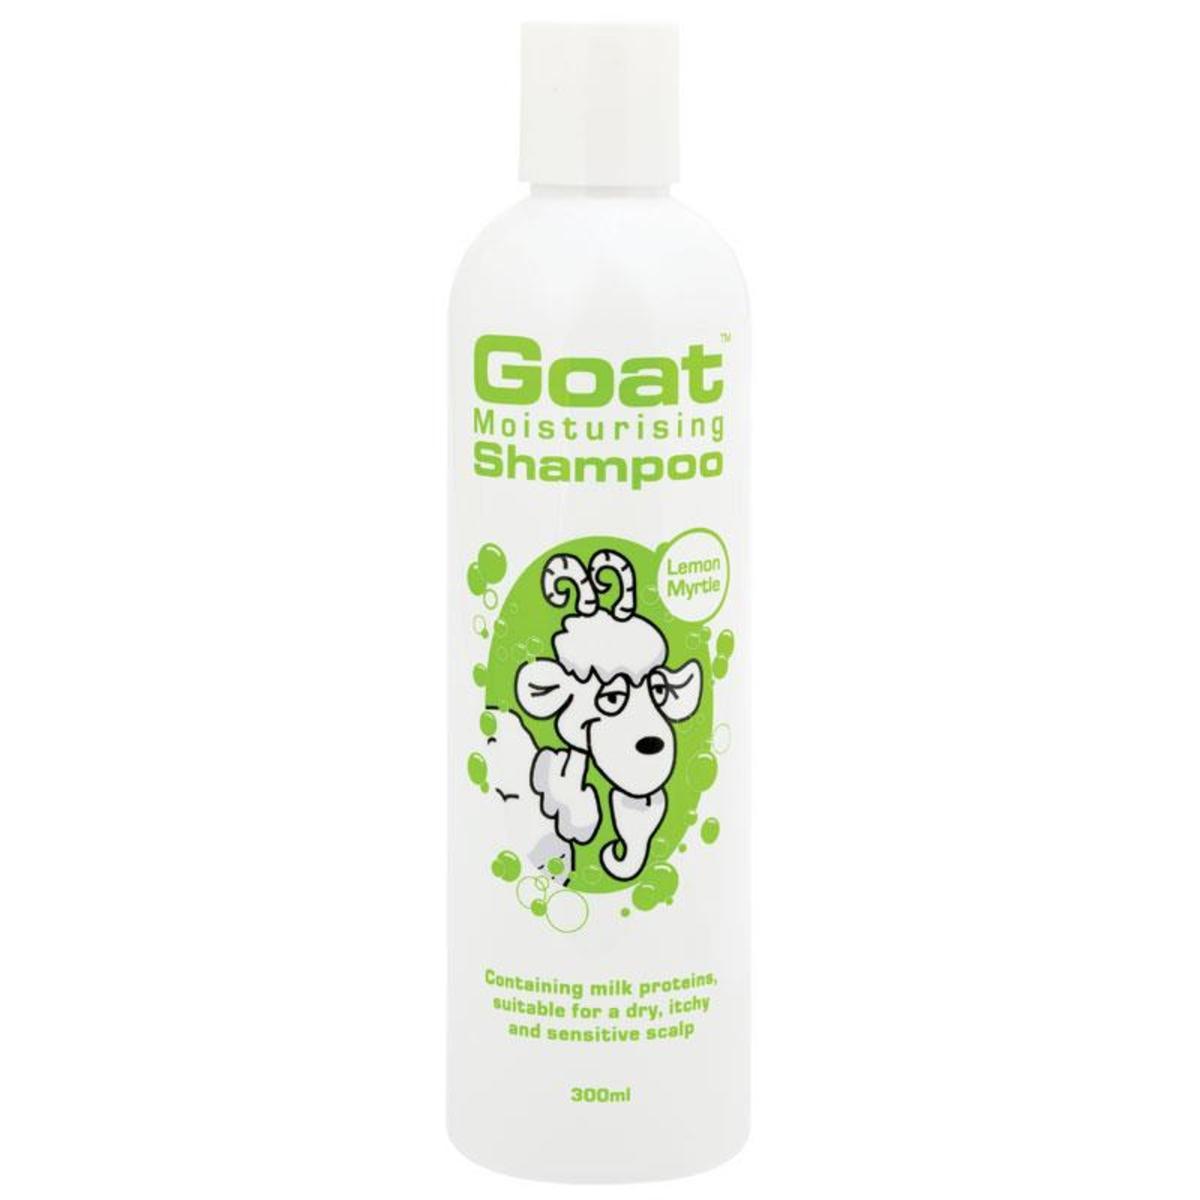 Goat Shampoo with lemon Myrtle 300ml (Parallel Import)